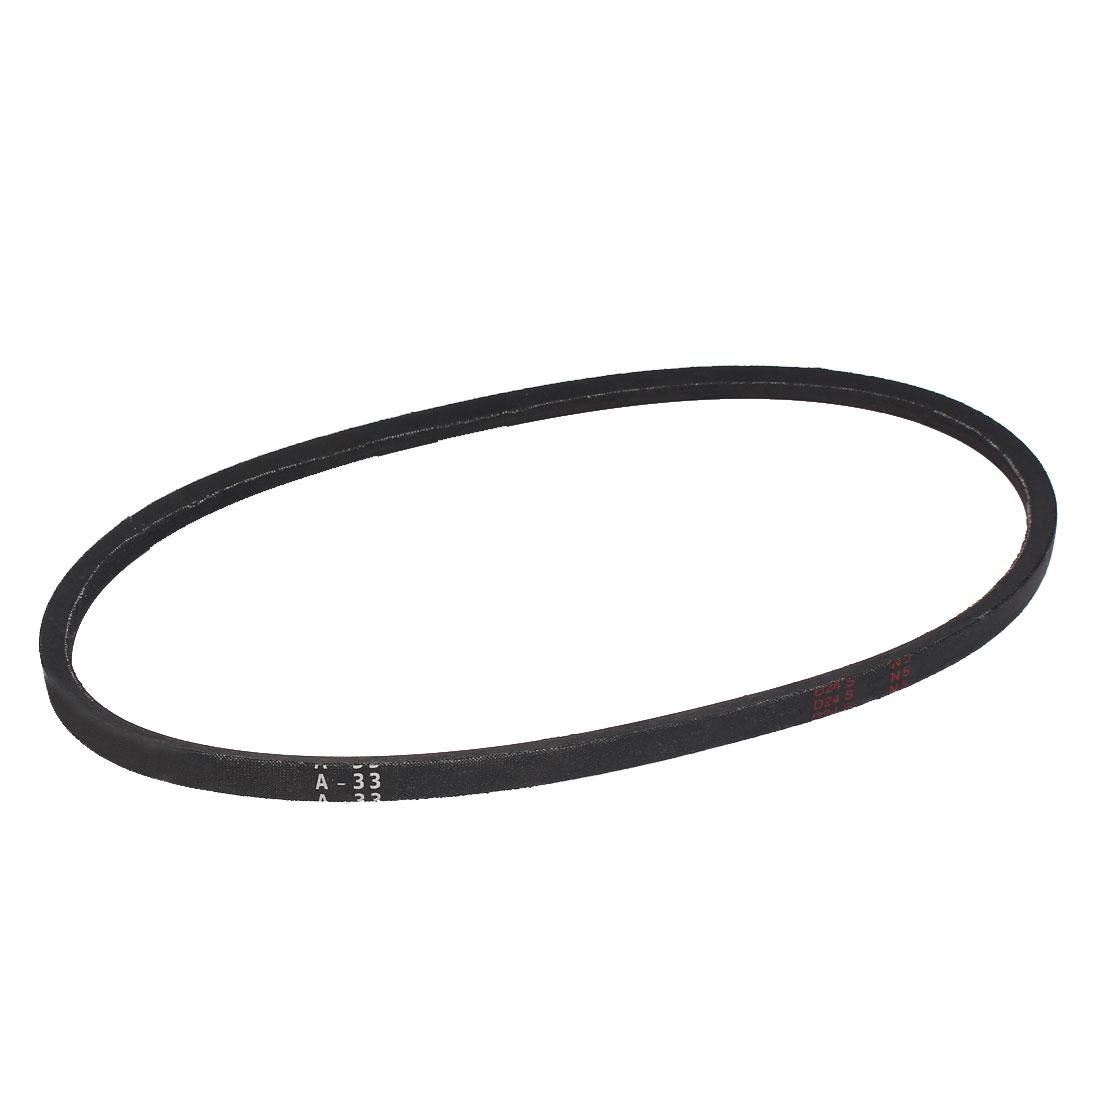 "A33 Type Rubber Machine Transmission Band Drive Vee V Belt 33"" x 1/2"" Black"